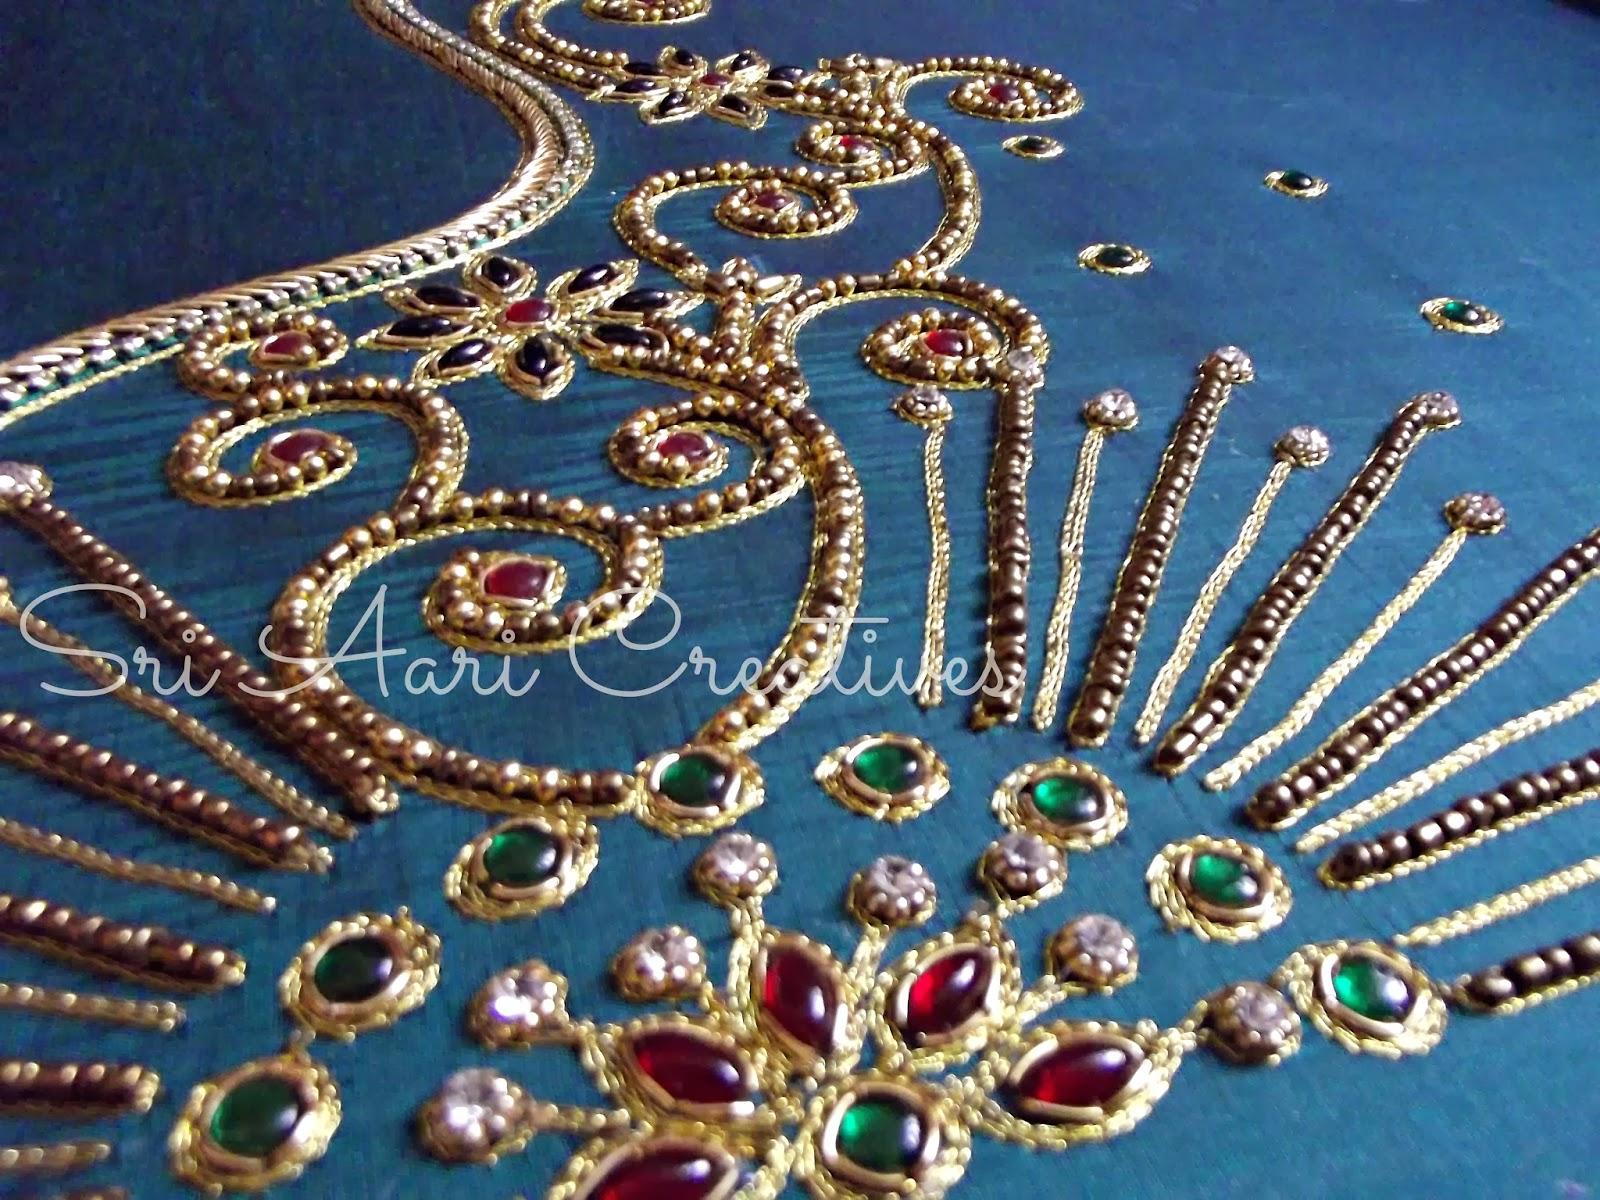 Sri aari creatives embroidery bridal blouse designs